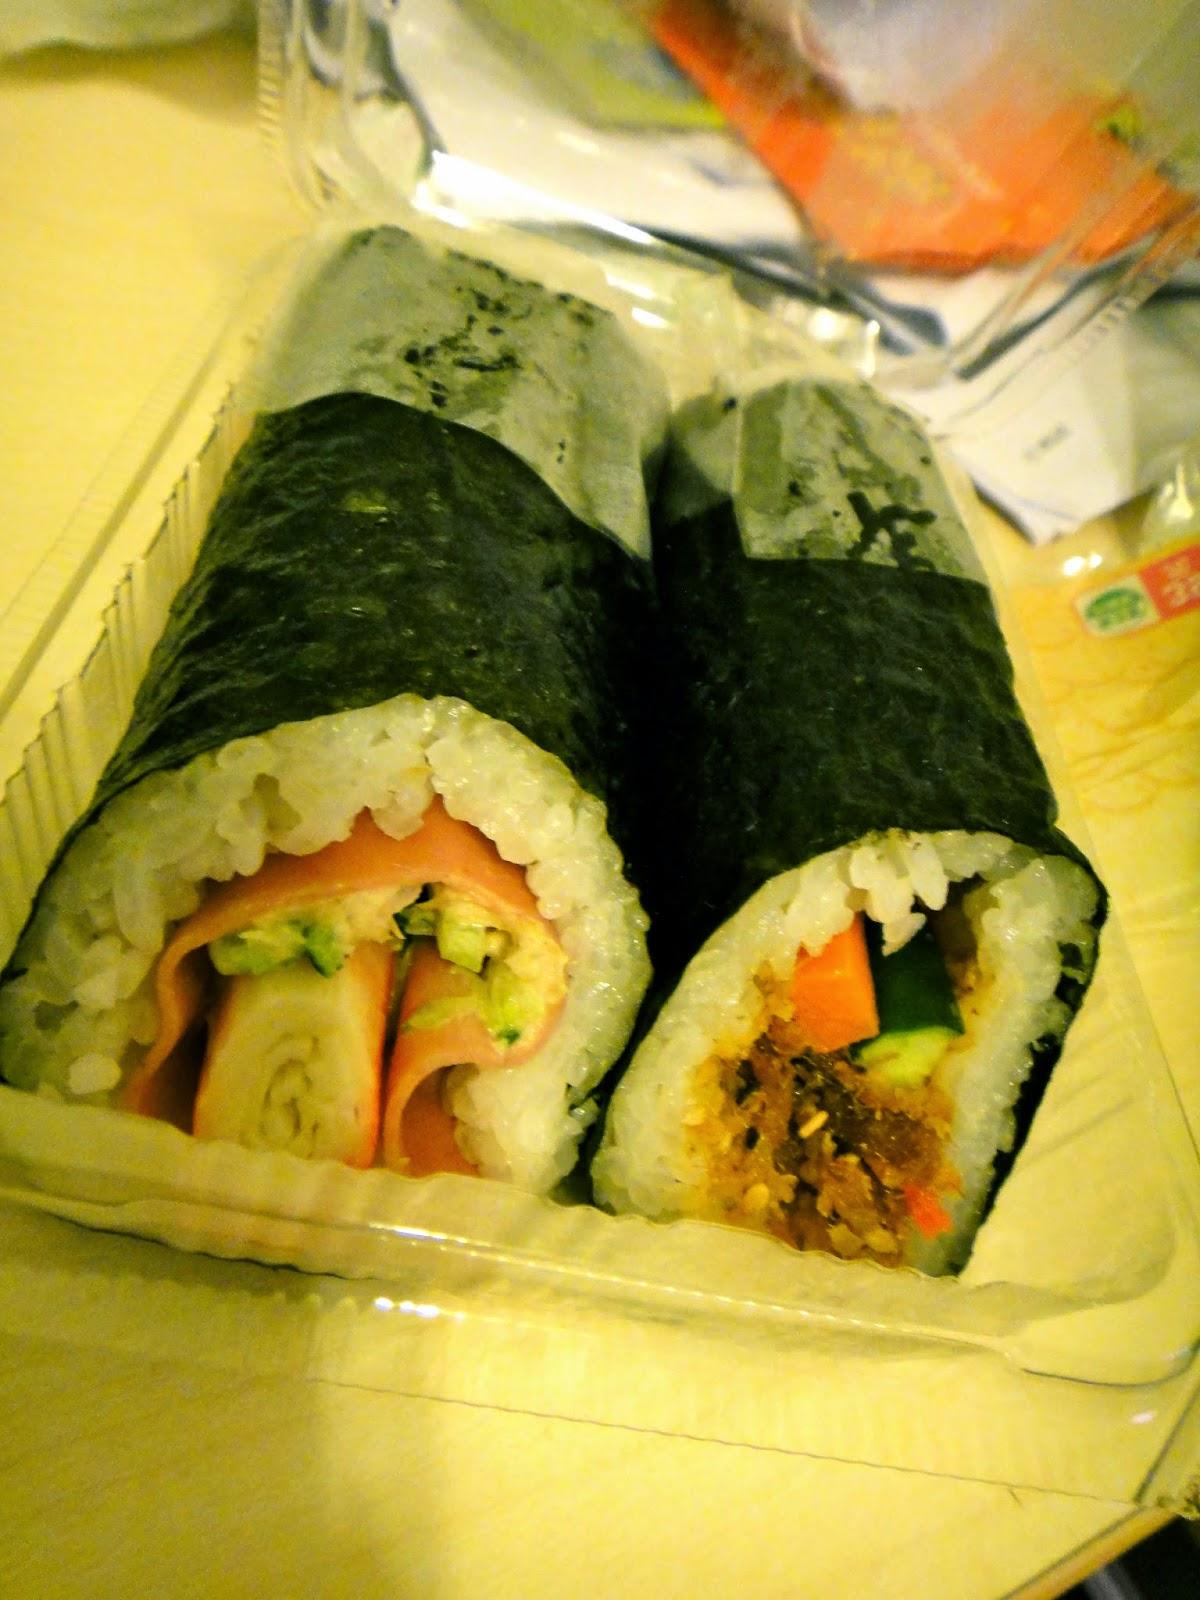 7-11 Floss Sushi Roll